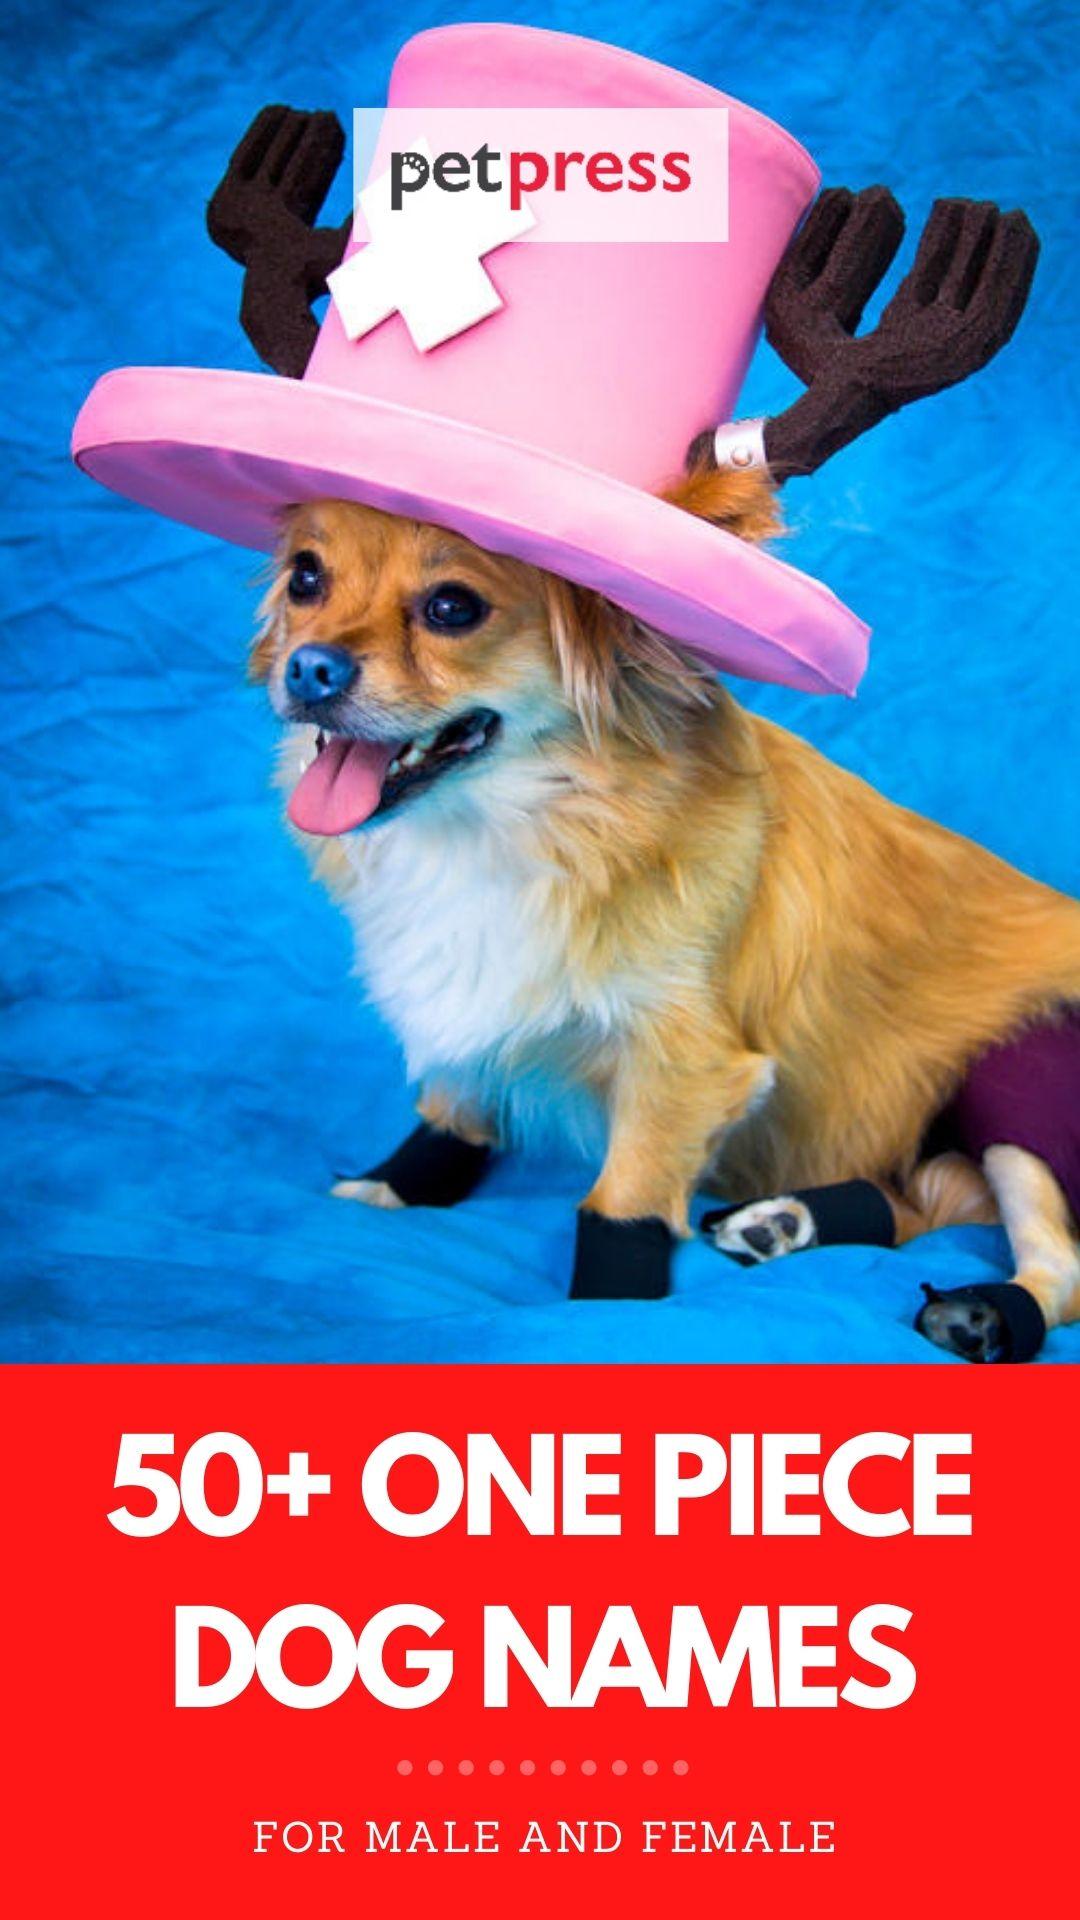 one piece dog names